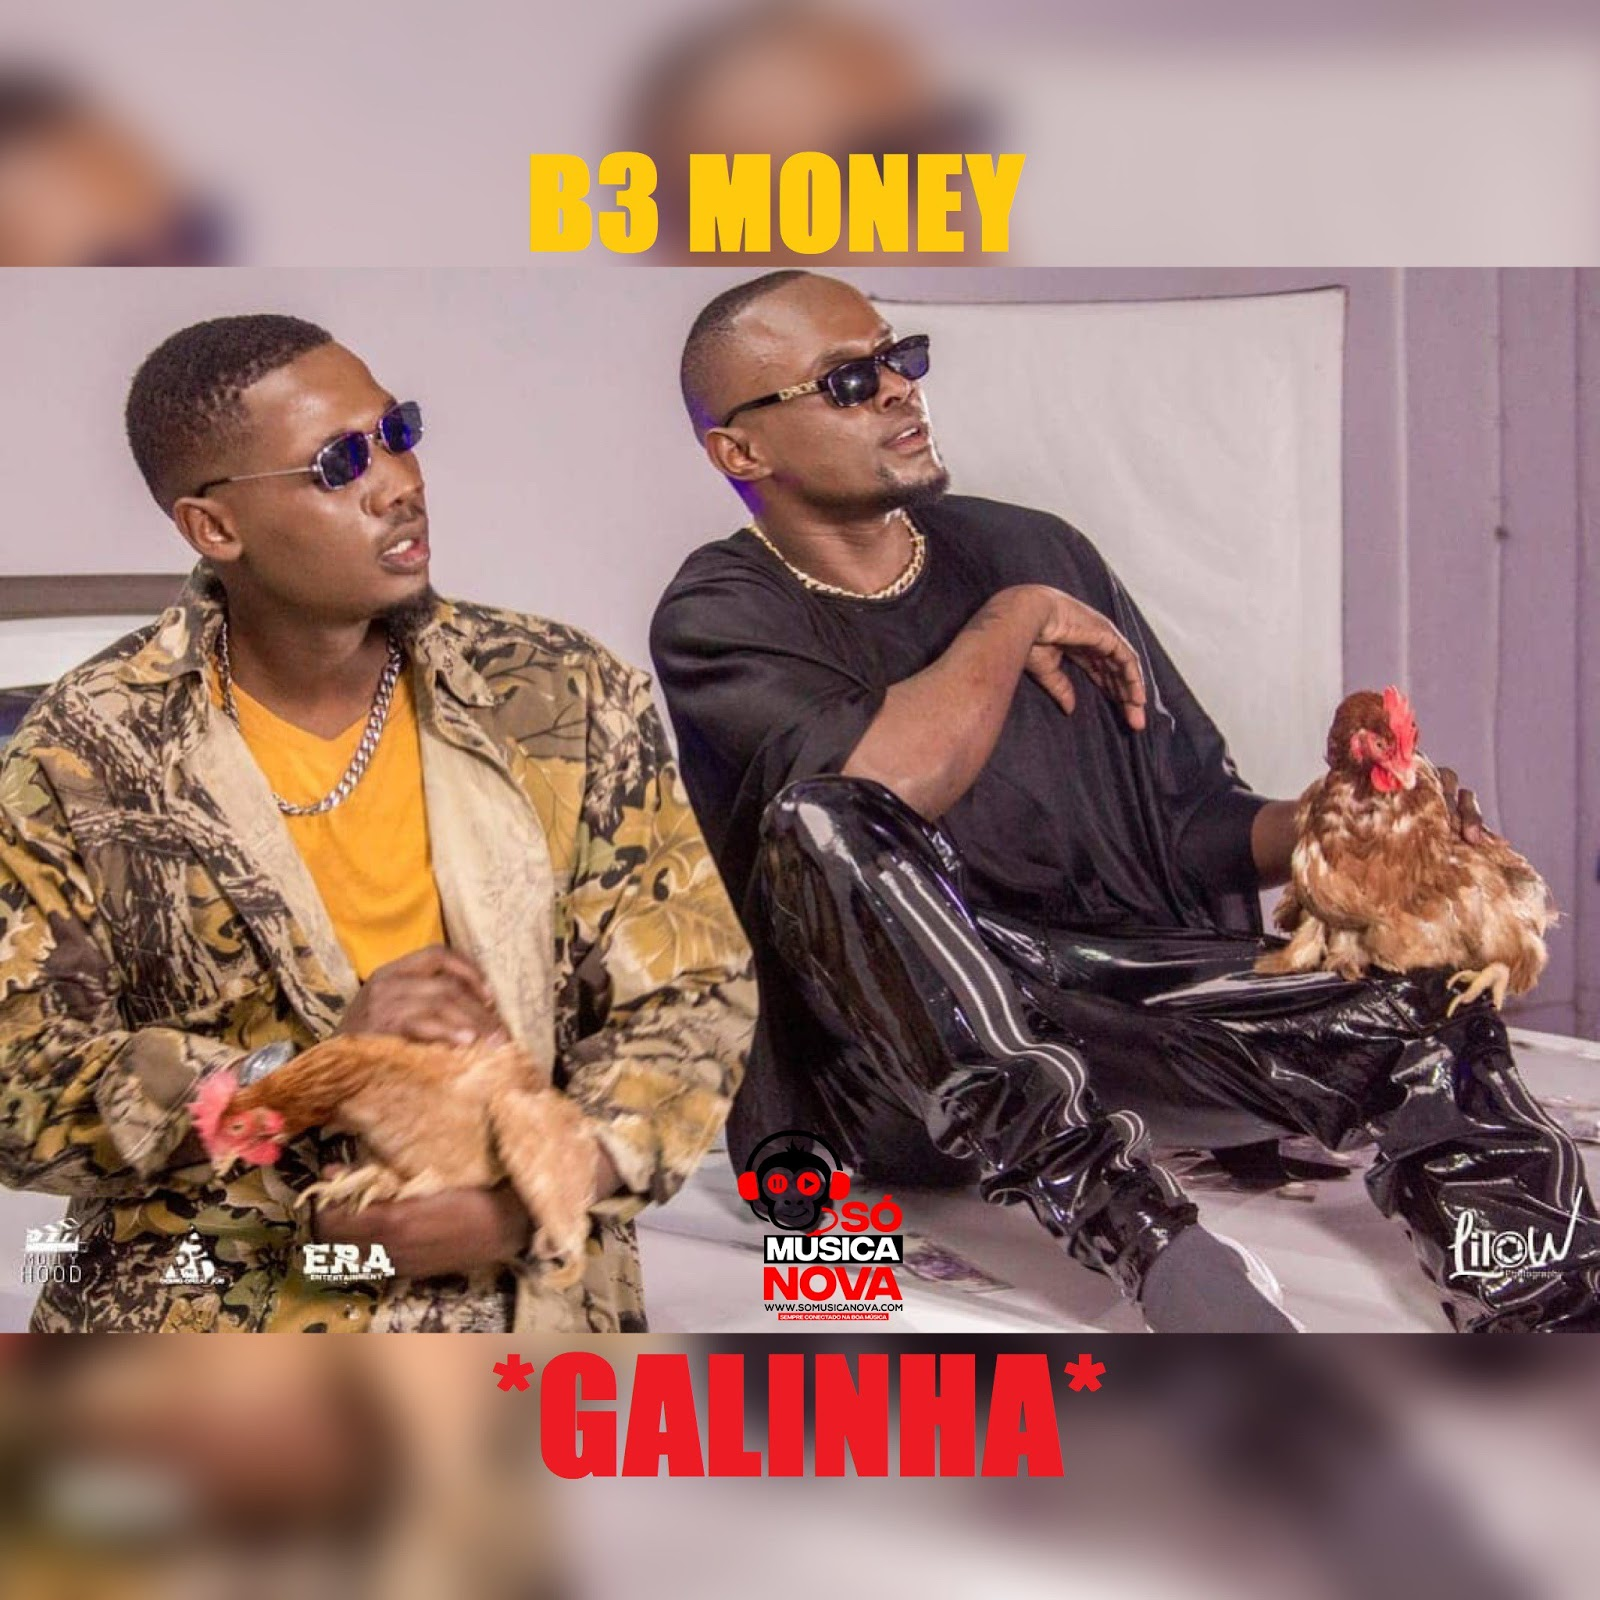 DOWNLOAD MP3: B3 Money – Galinha [2019]